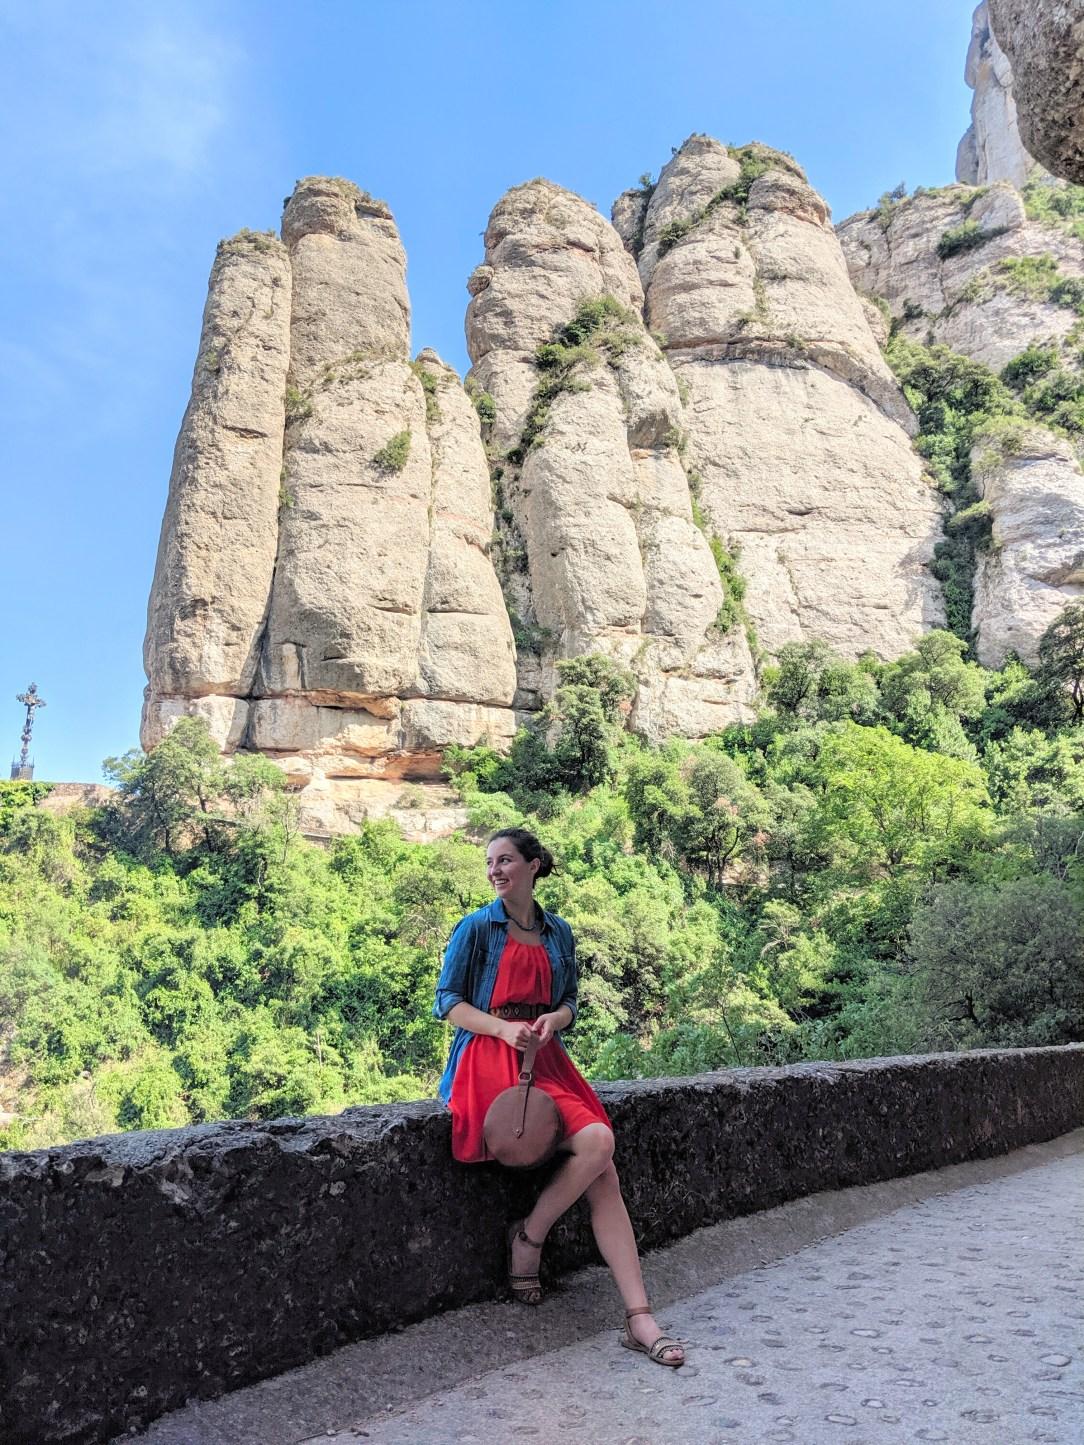 Spain, Barcelona, Catalonia, hiking